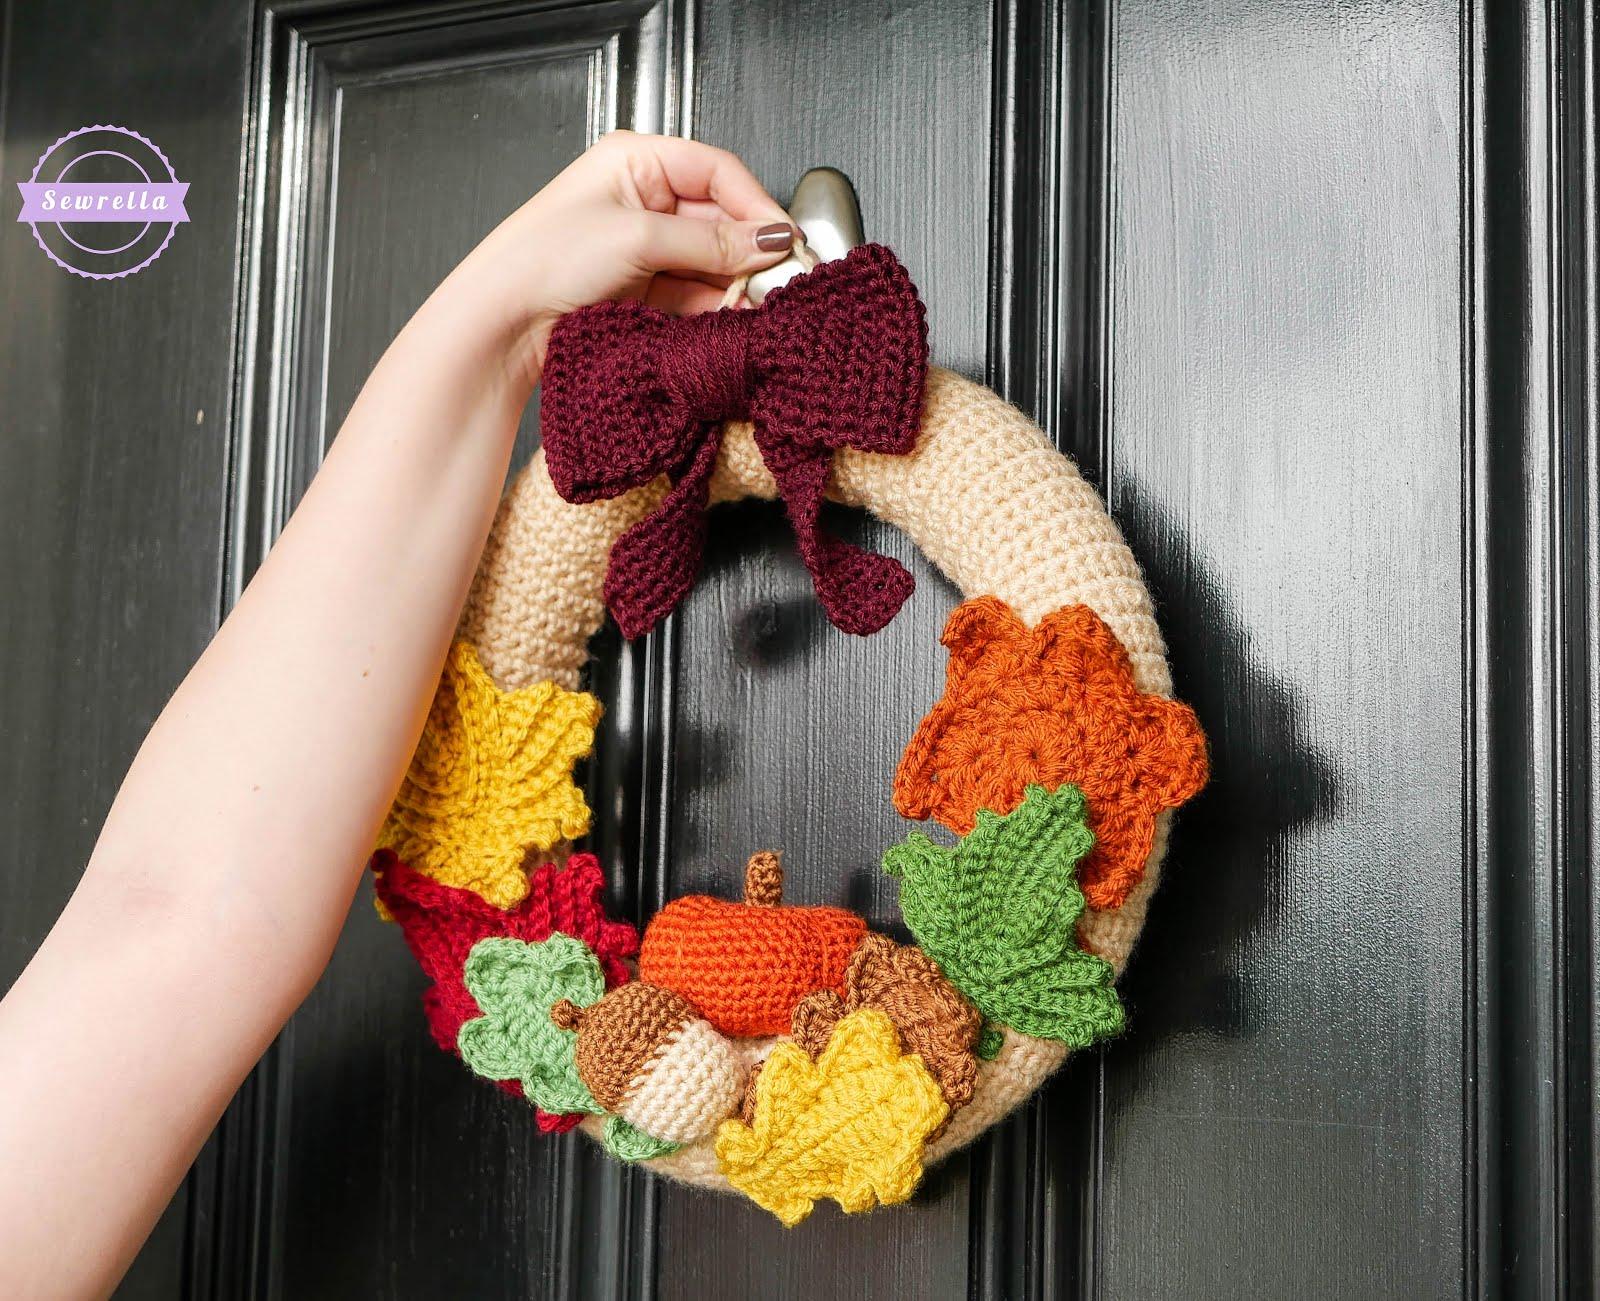 Mornings of Autumn Crochet Wreath - Sewrella